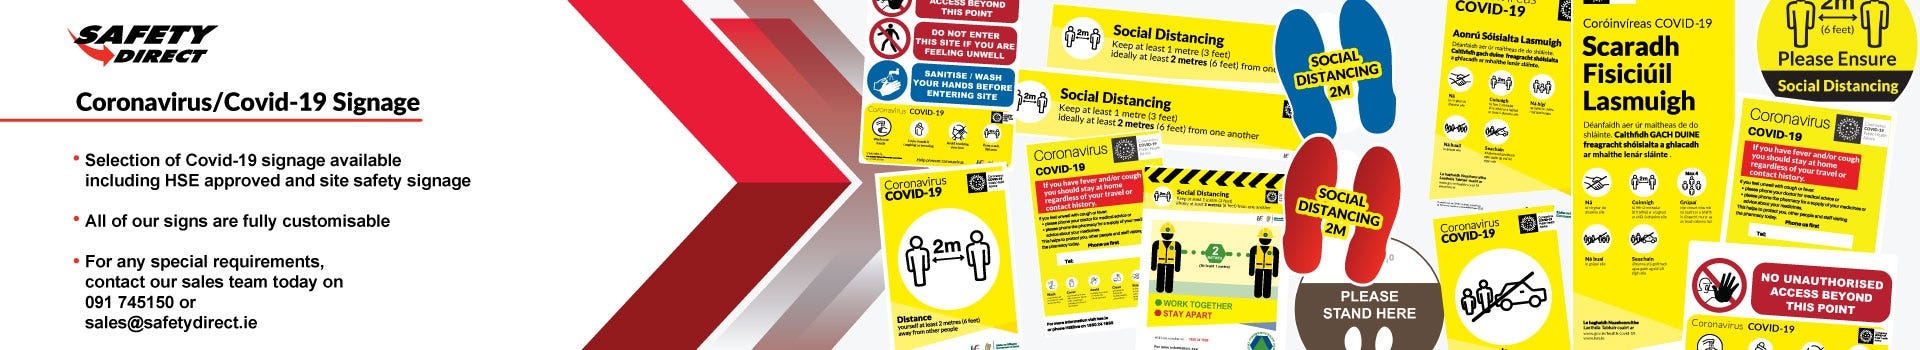 Coronavirus/Covid 19 Signage and Labels